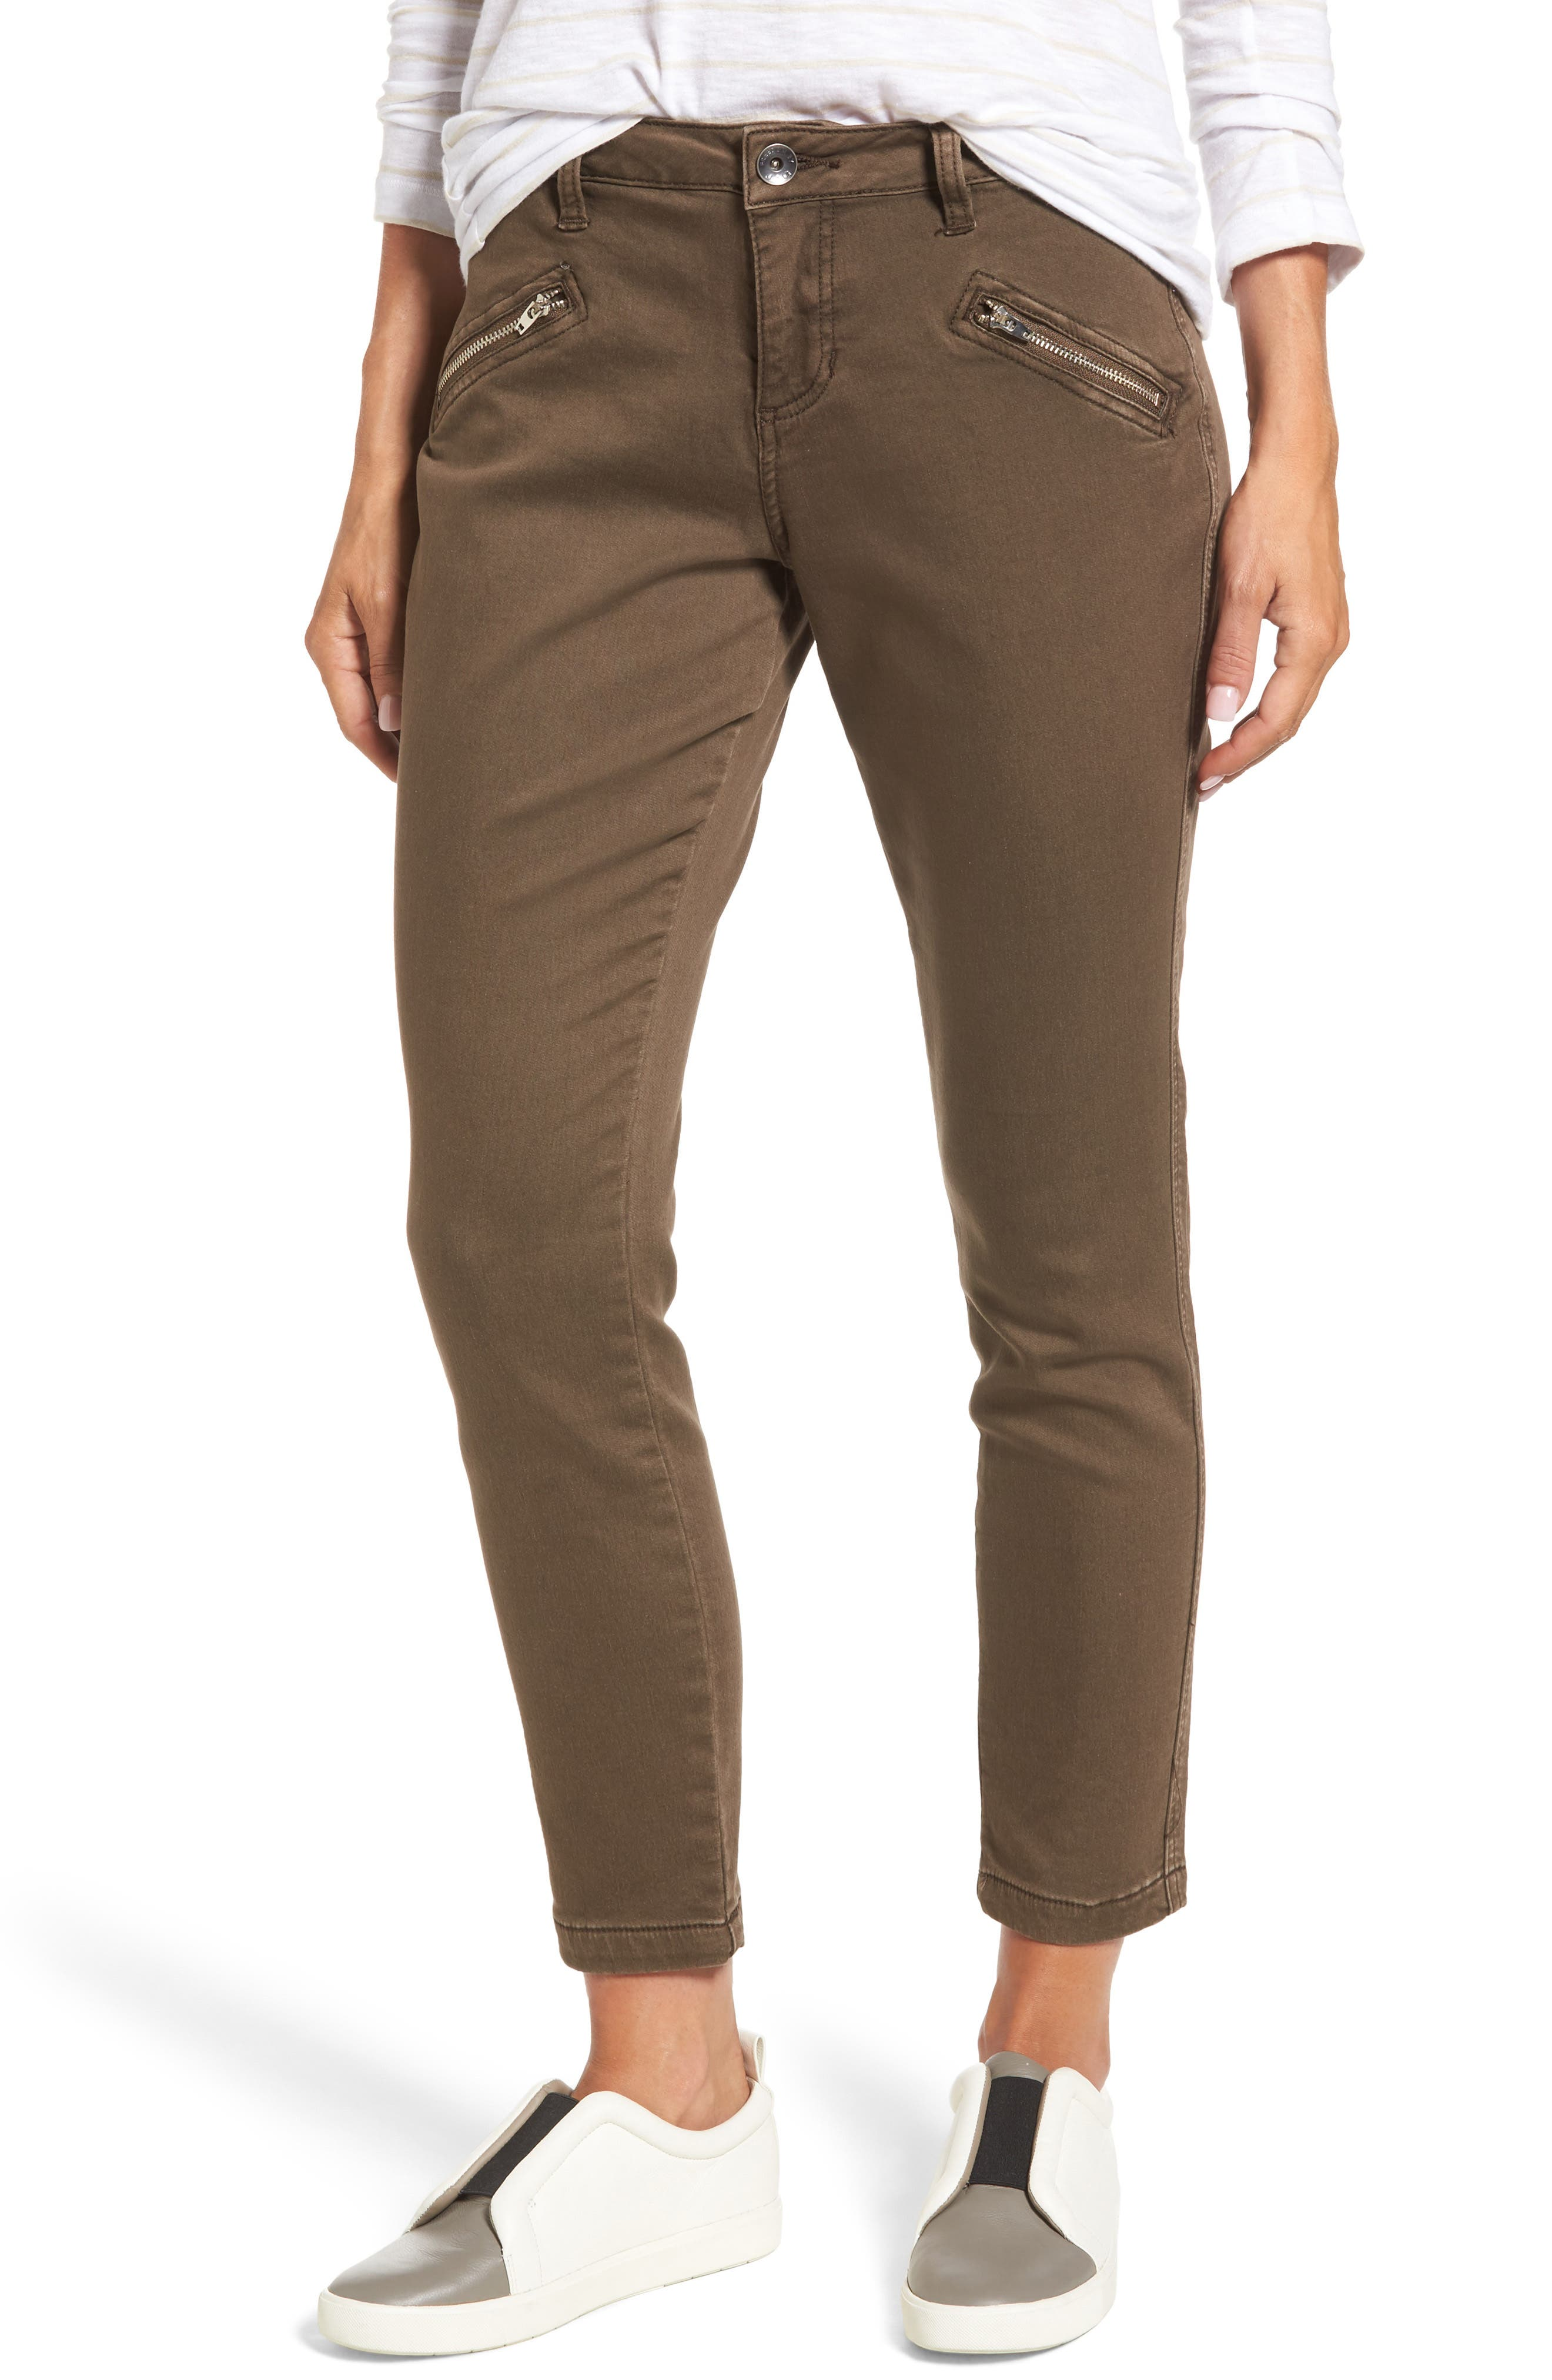 Ryan Knit Skinny Jeans,                             Main thumbnail 1, color,                             Saddle